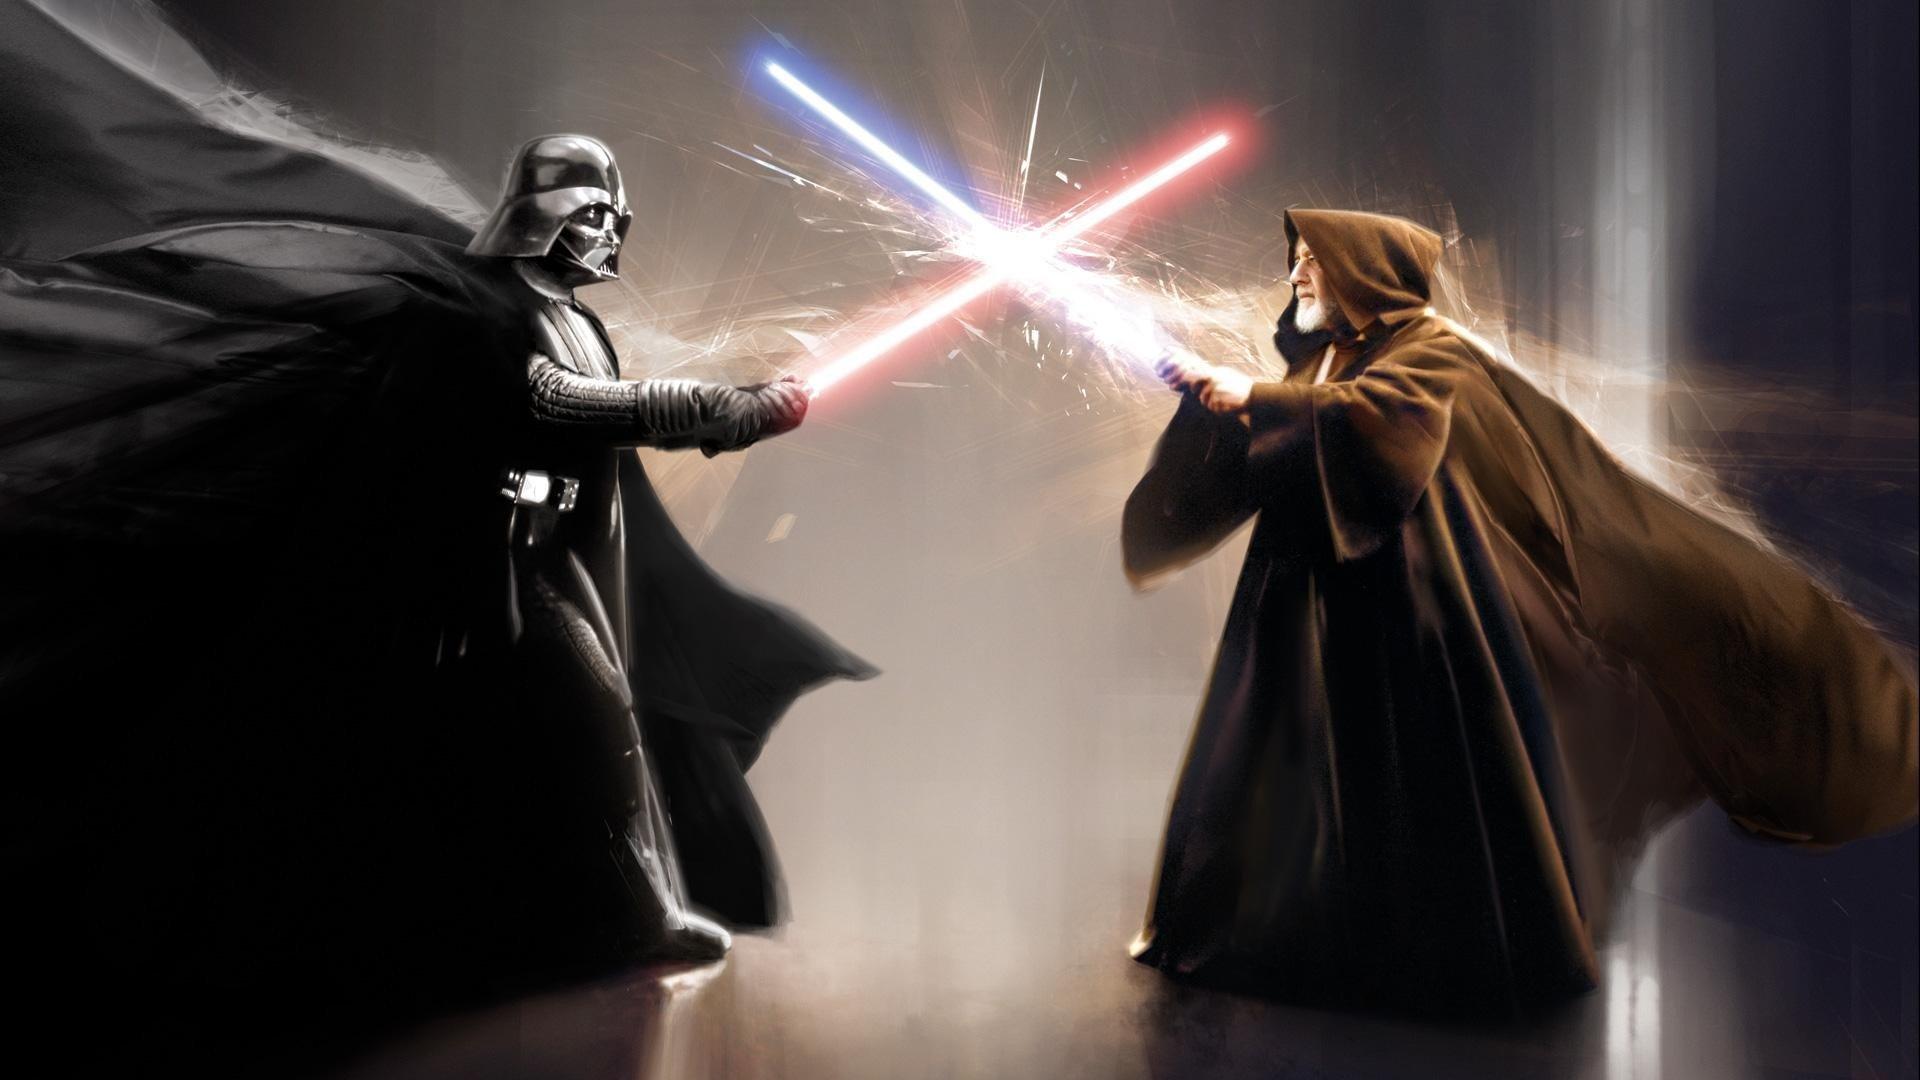 Obi Wan Kenobi Wallpapers Hd For Desktop Backgrounds